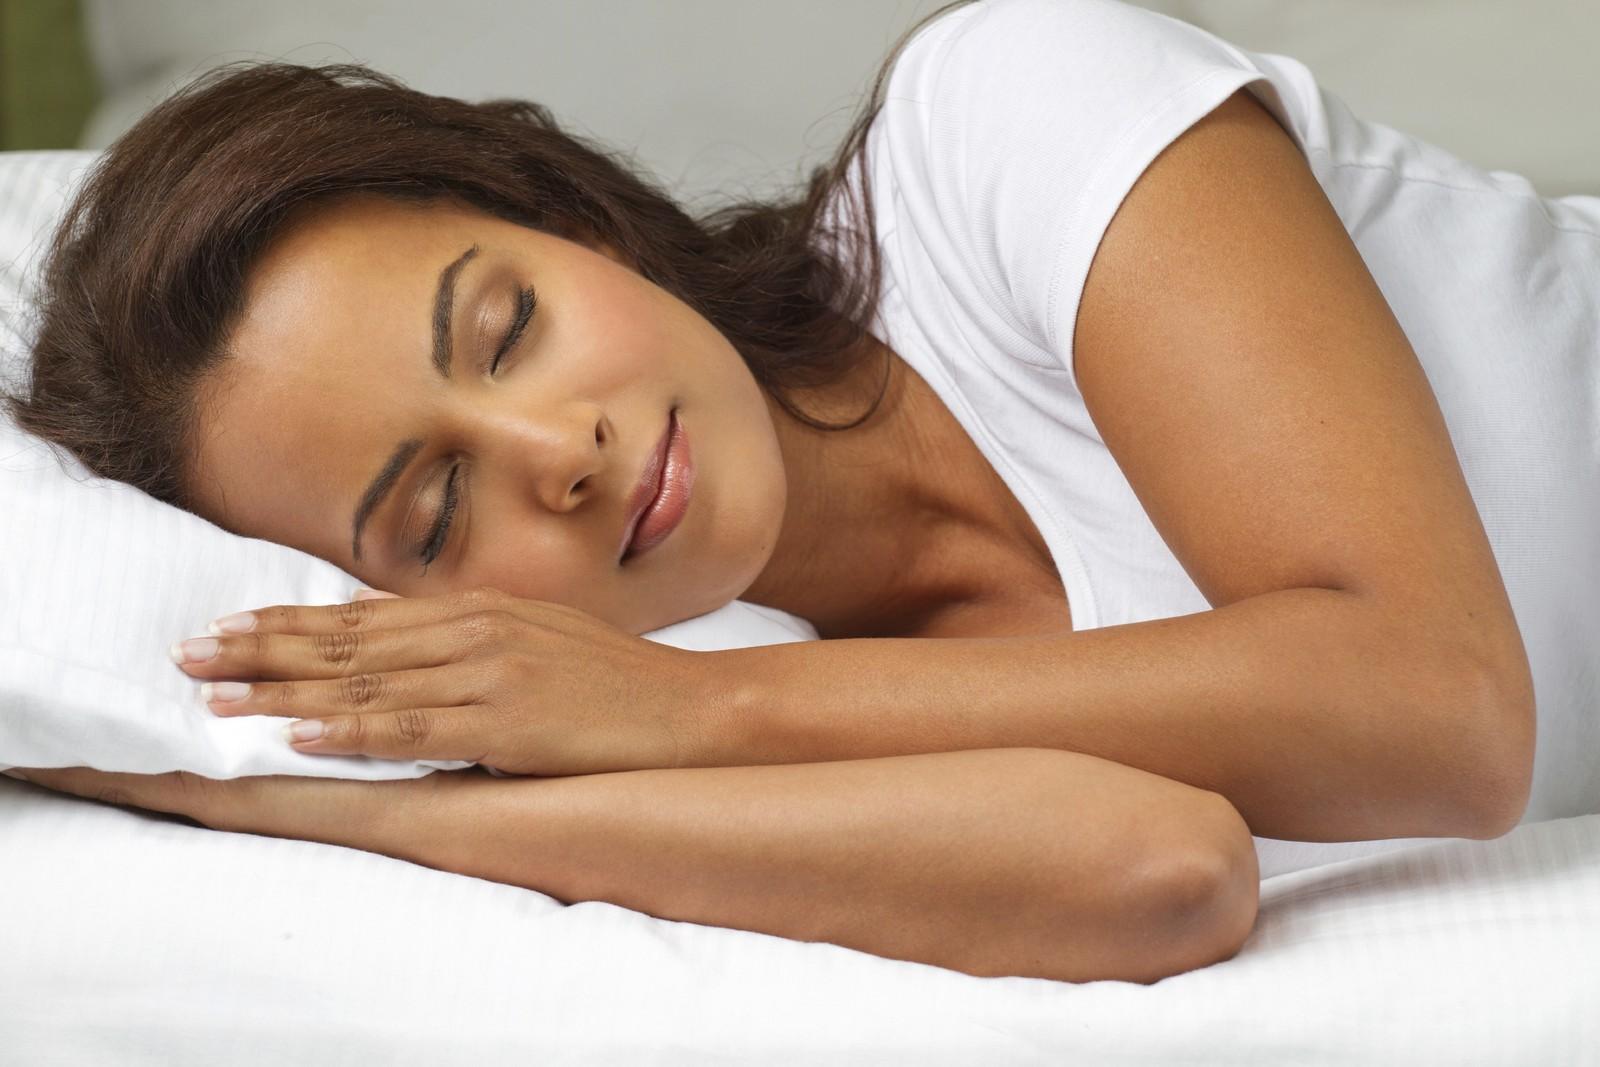 Women need more sleep than men